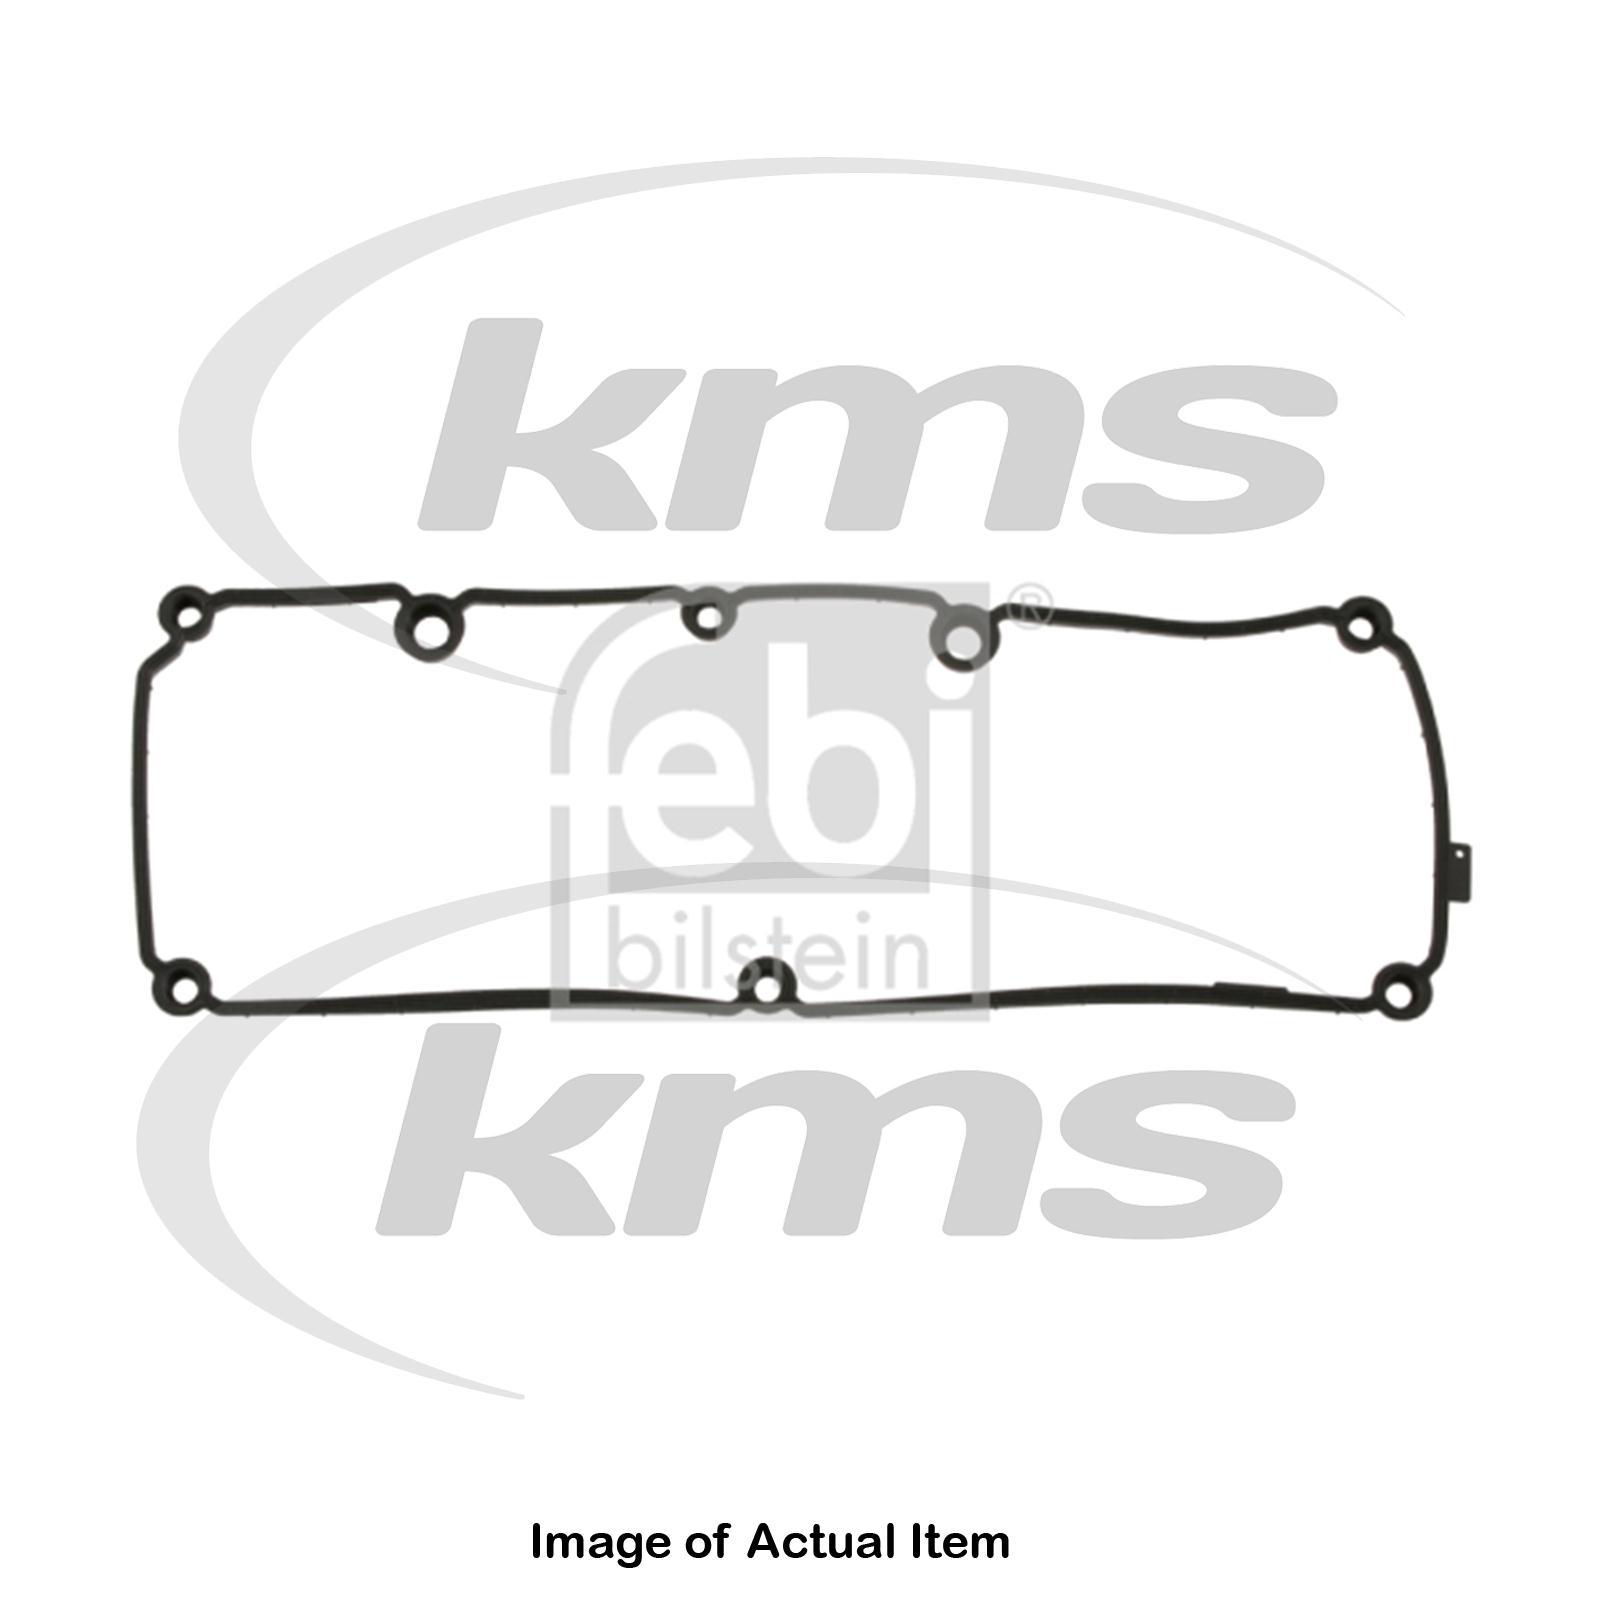 corvair front suspension diagram